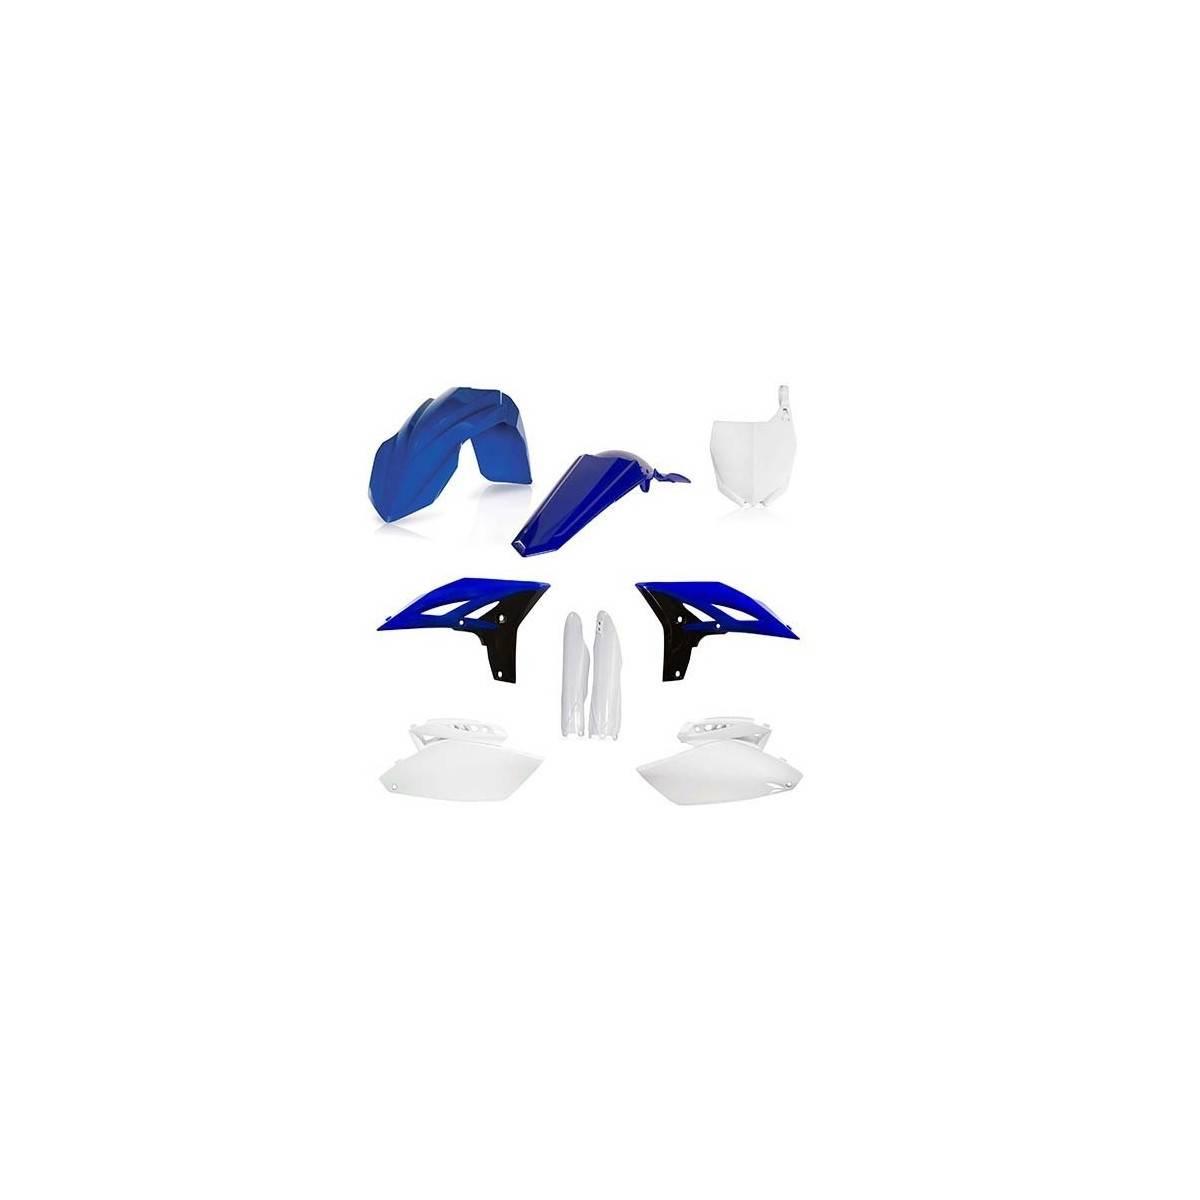 0022808-040 - Full Kit Plasticos Tc85 14 17 Azul